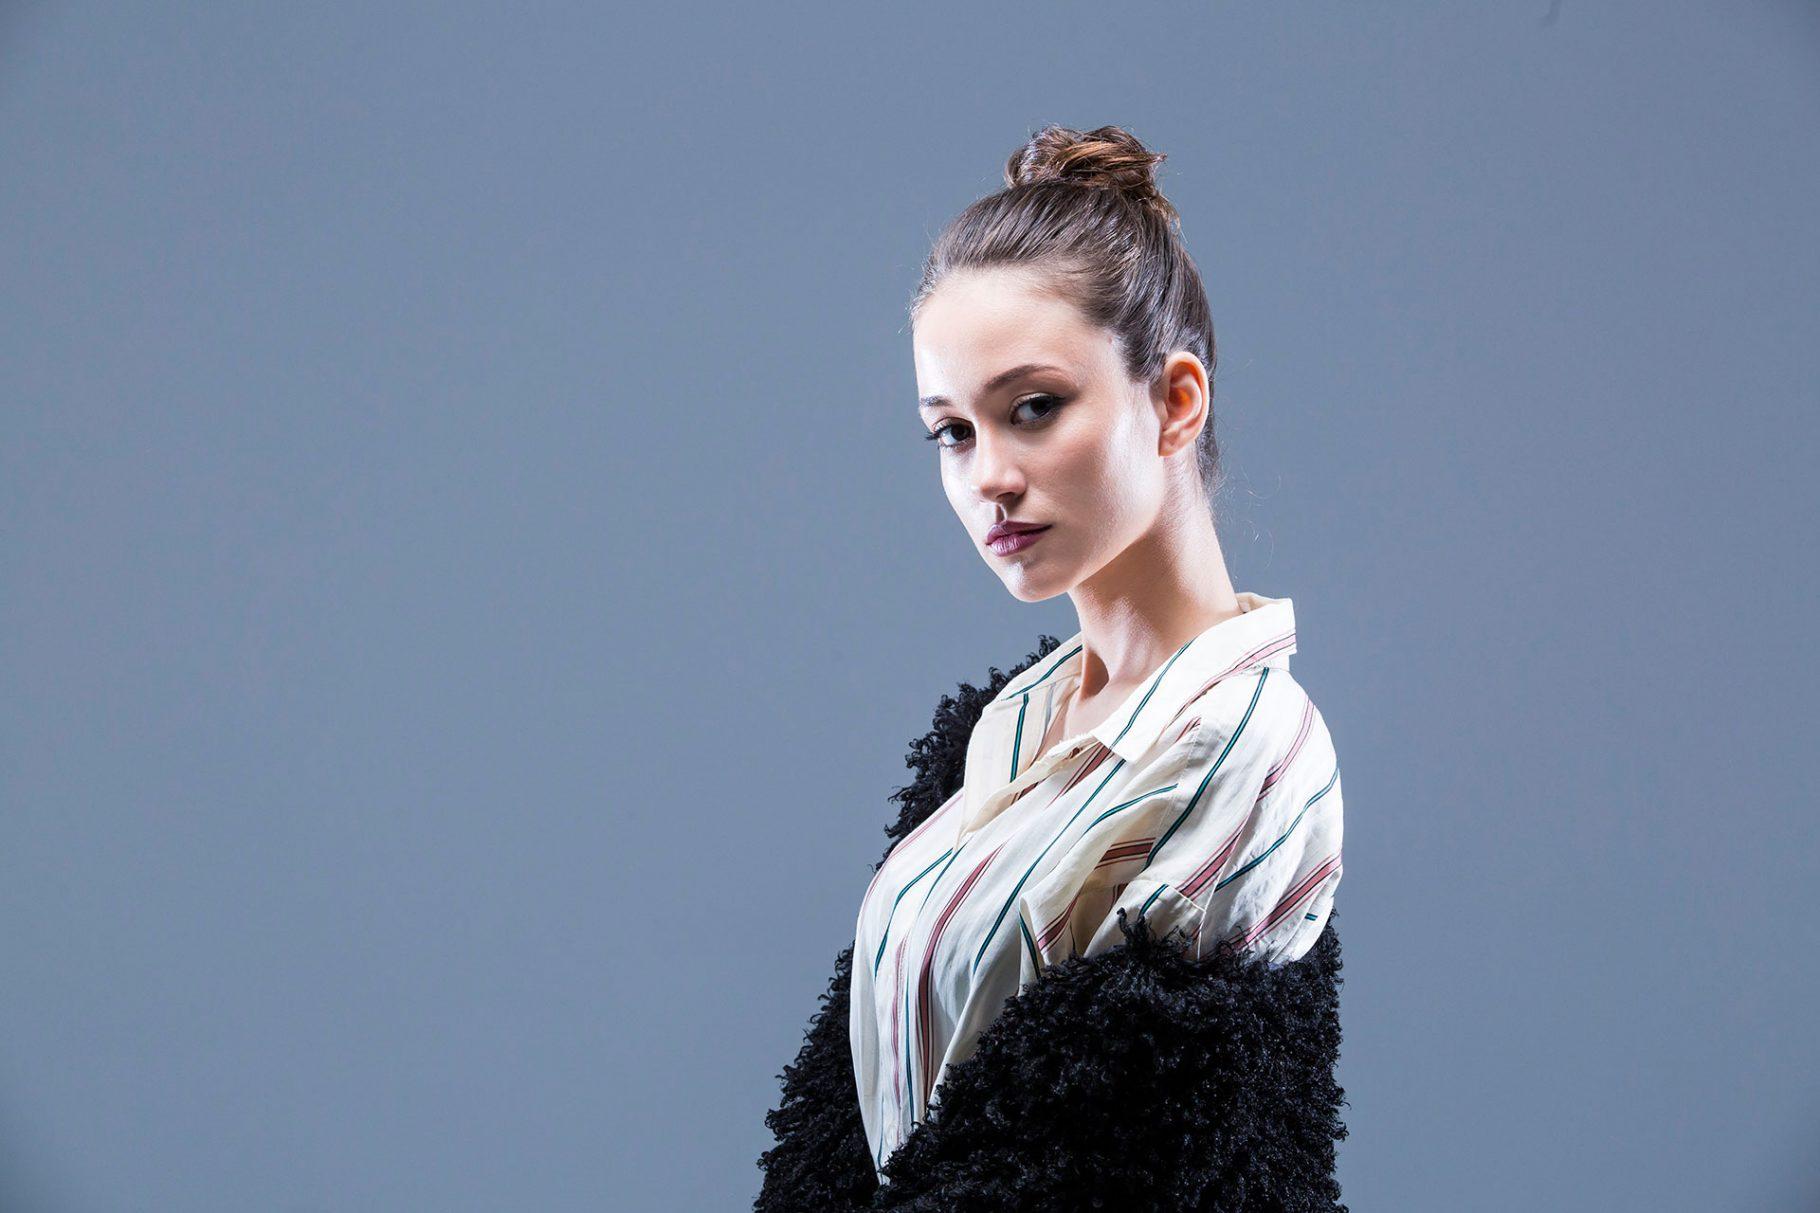 Denitsa Karaslavova